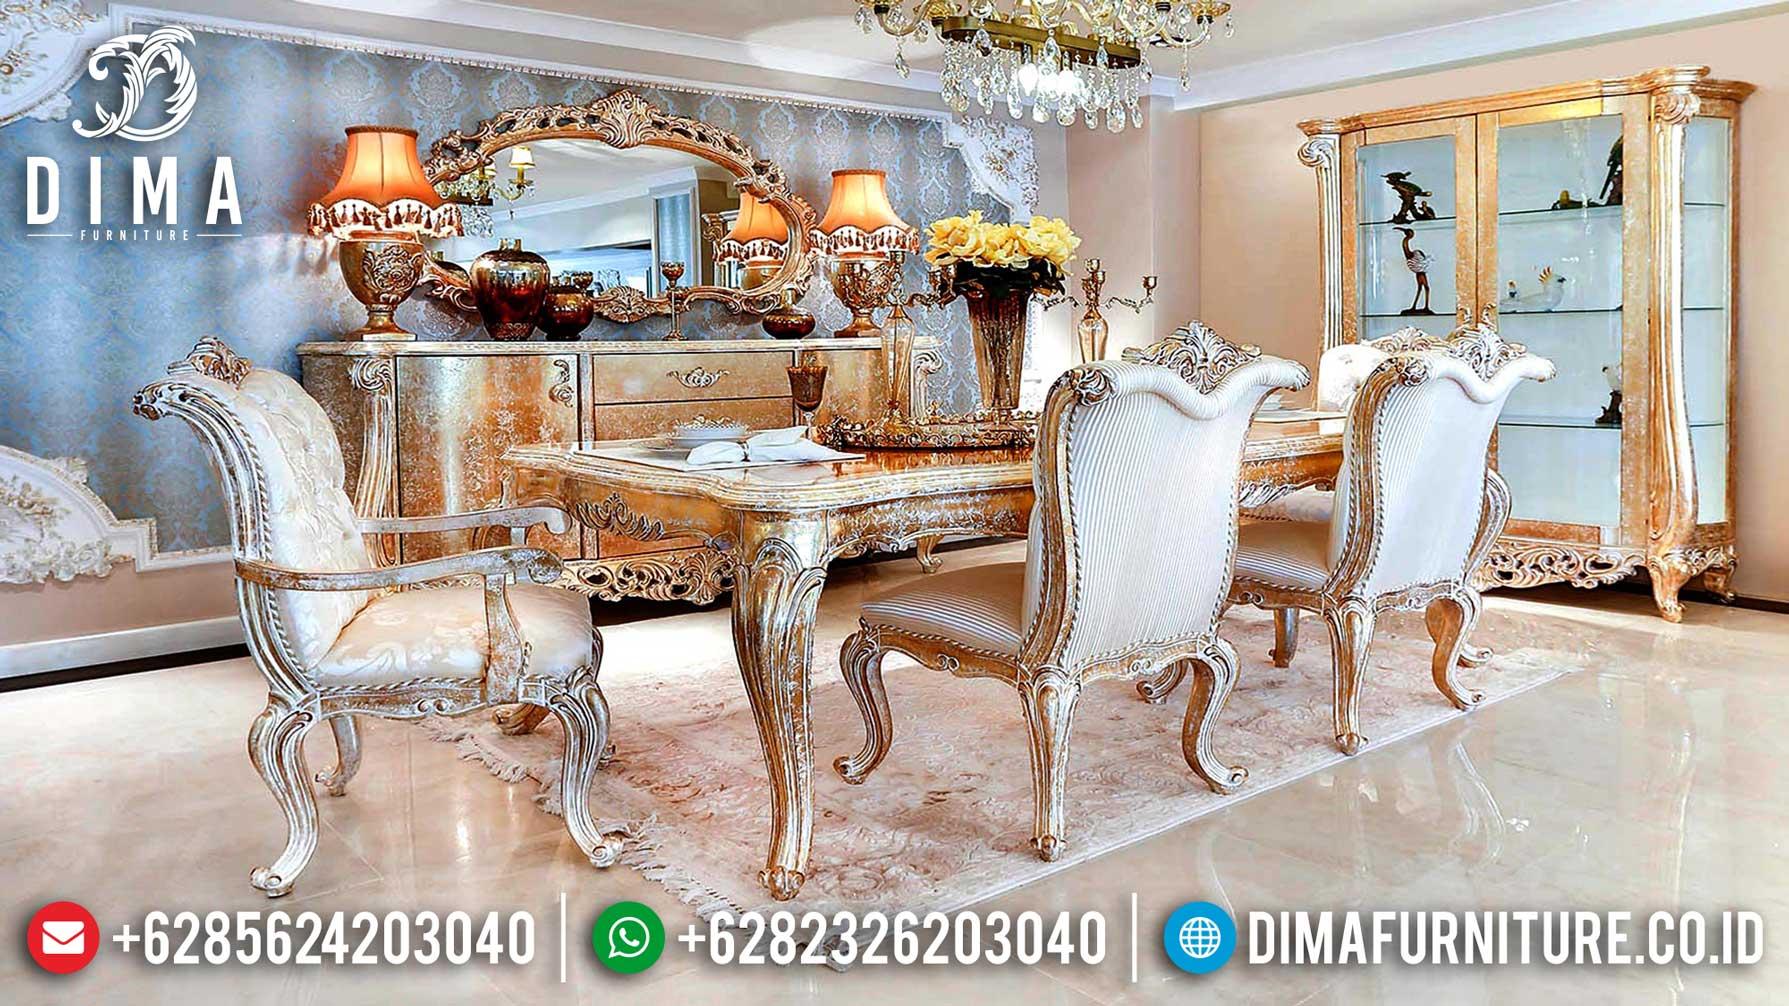 Harga Meja Makan Mewah Ukiran Classic Luxury Best Sale 2020 ST-1029